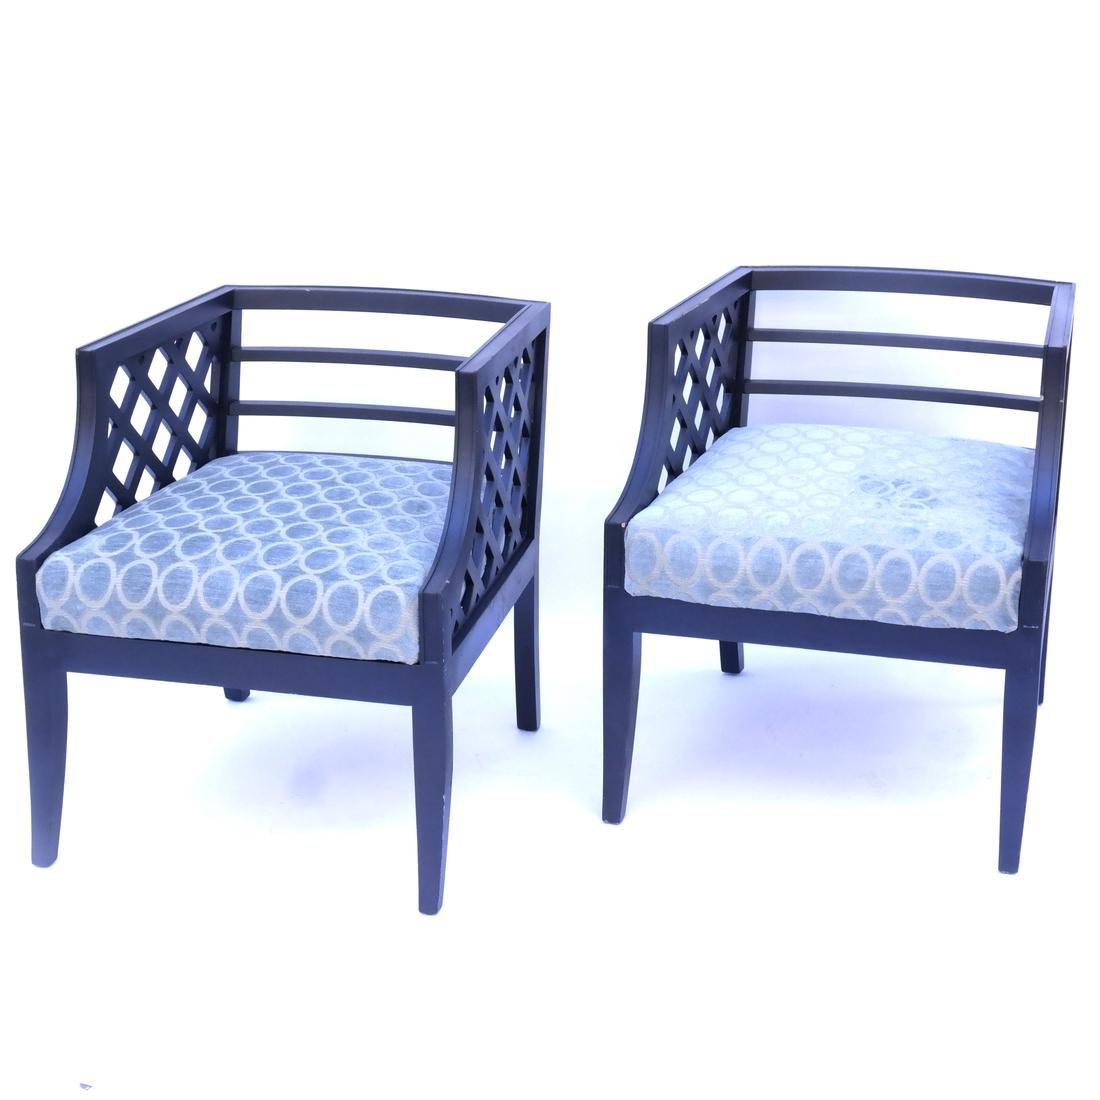 Pair of Lattice-Form Chairs